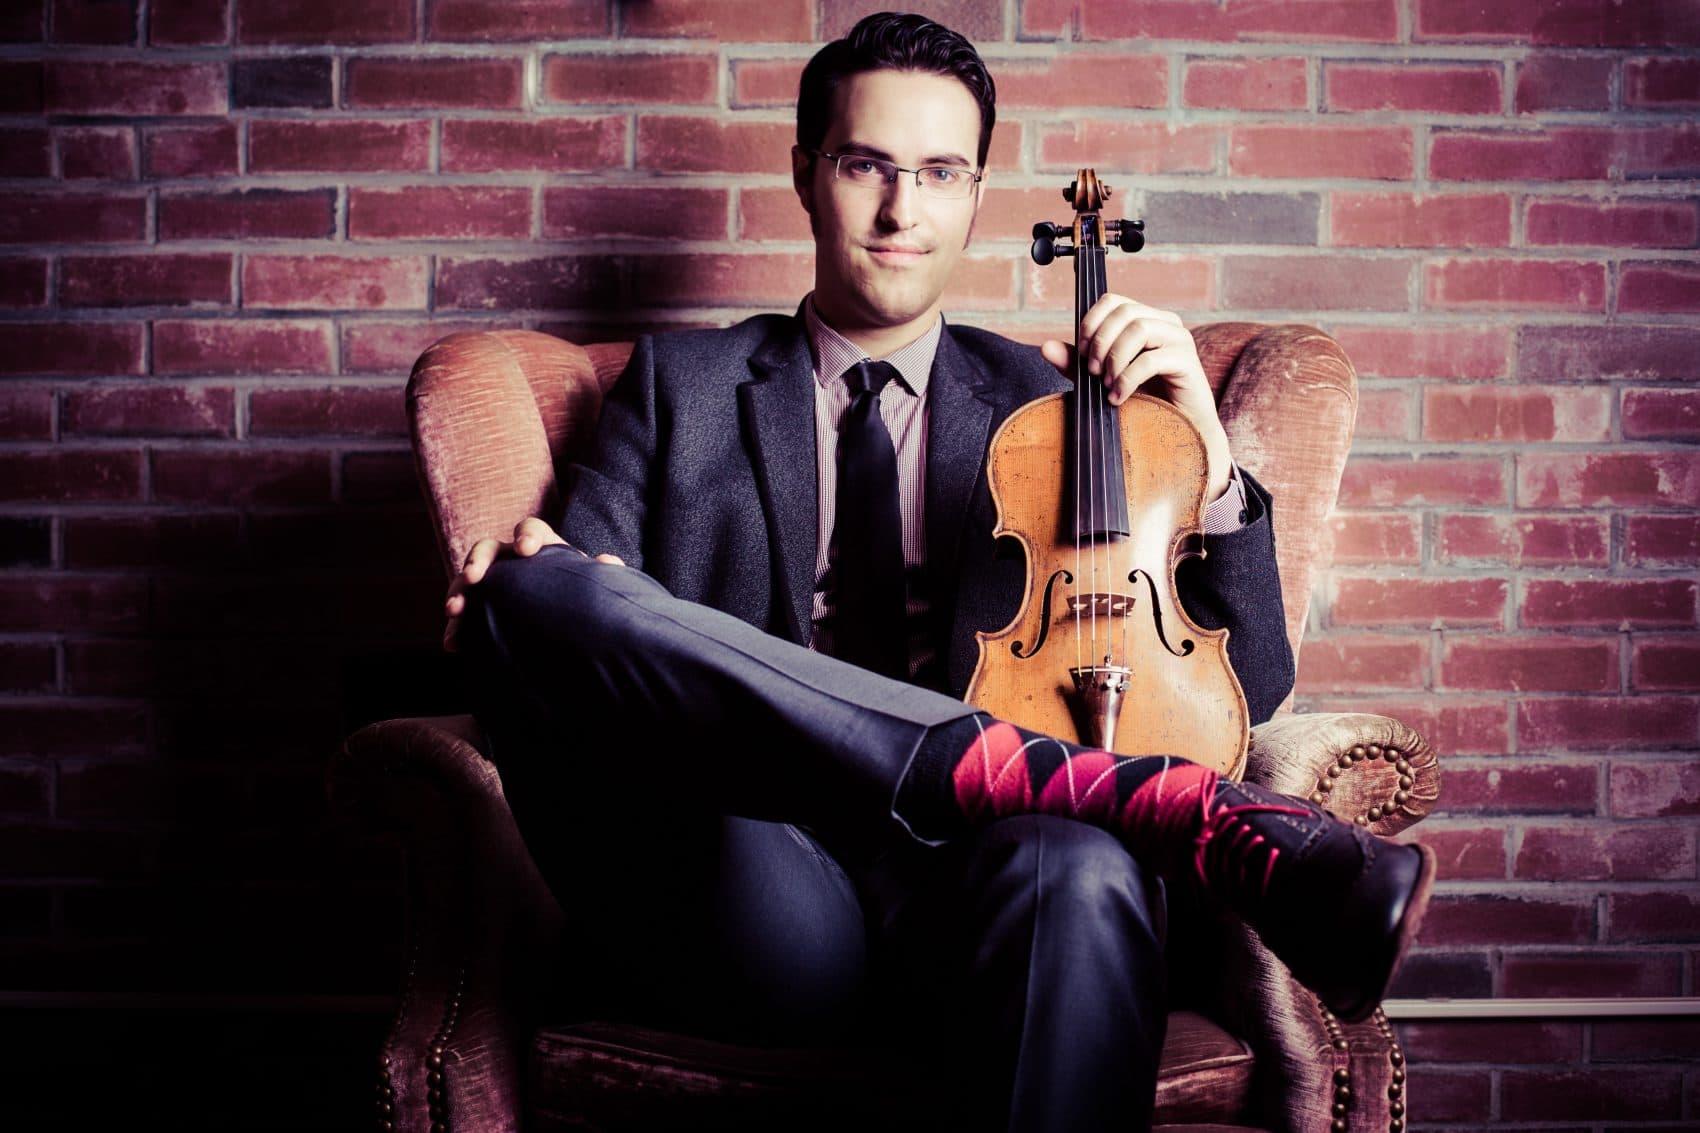 Jazz violinist Jason Anick founded the Rhythm Future Quartet and teaches at Berklee. (Courtesy Jason Anick)